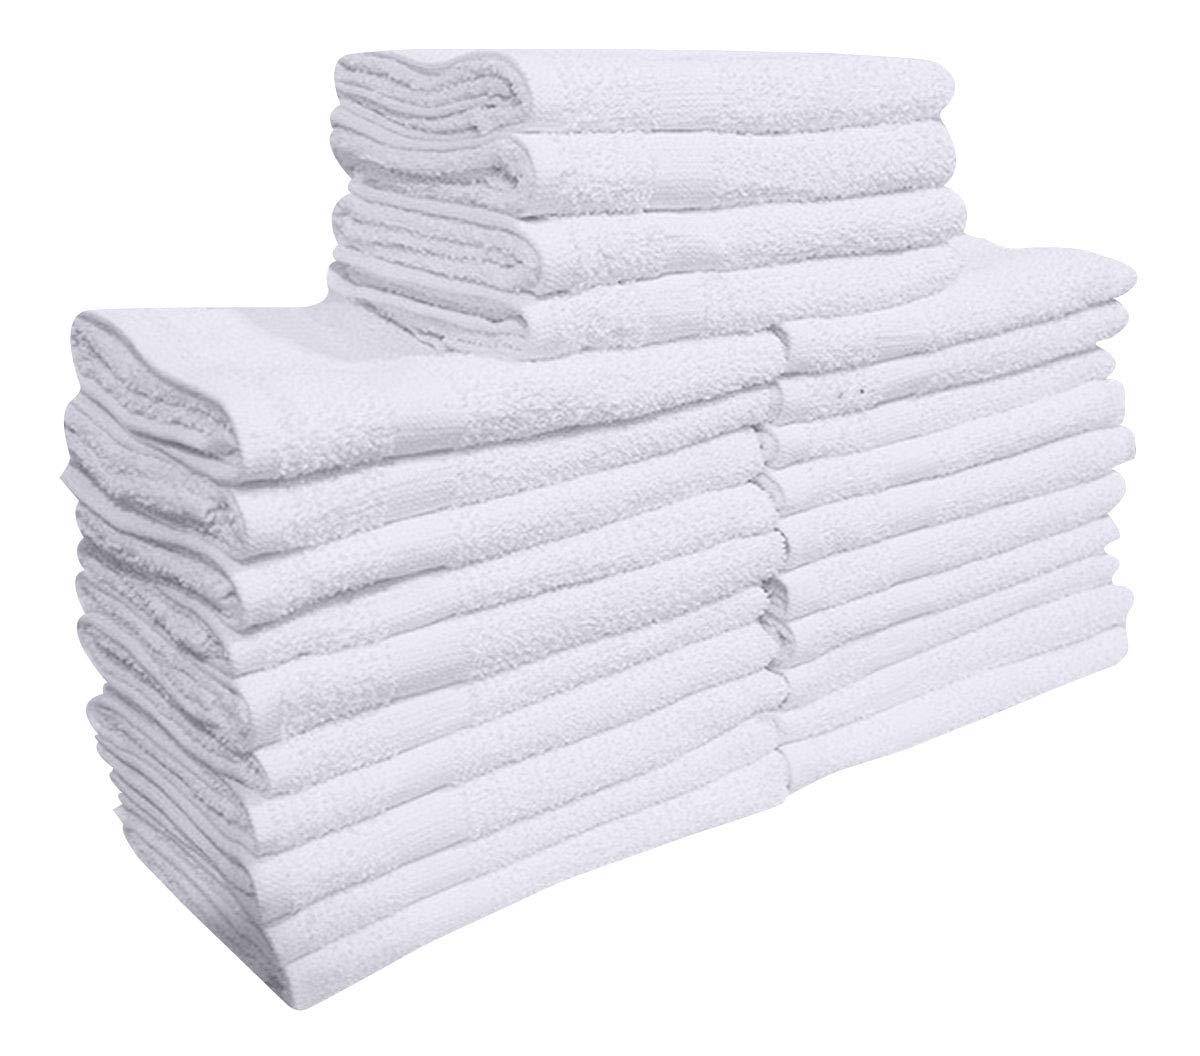 Salon Towel 6 Pcs 16x27 Hand Towel Gym Spa Hair Towels